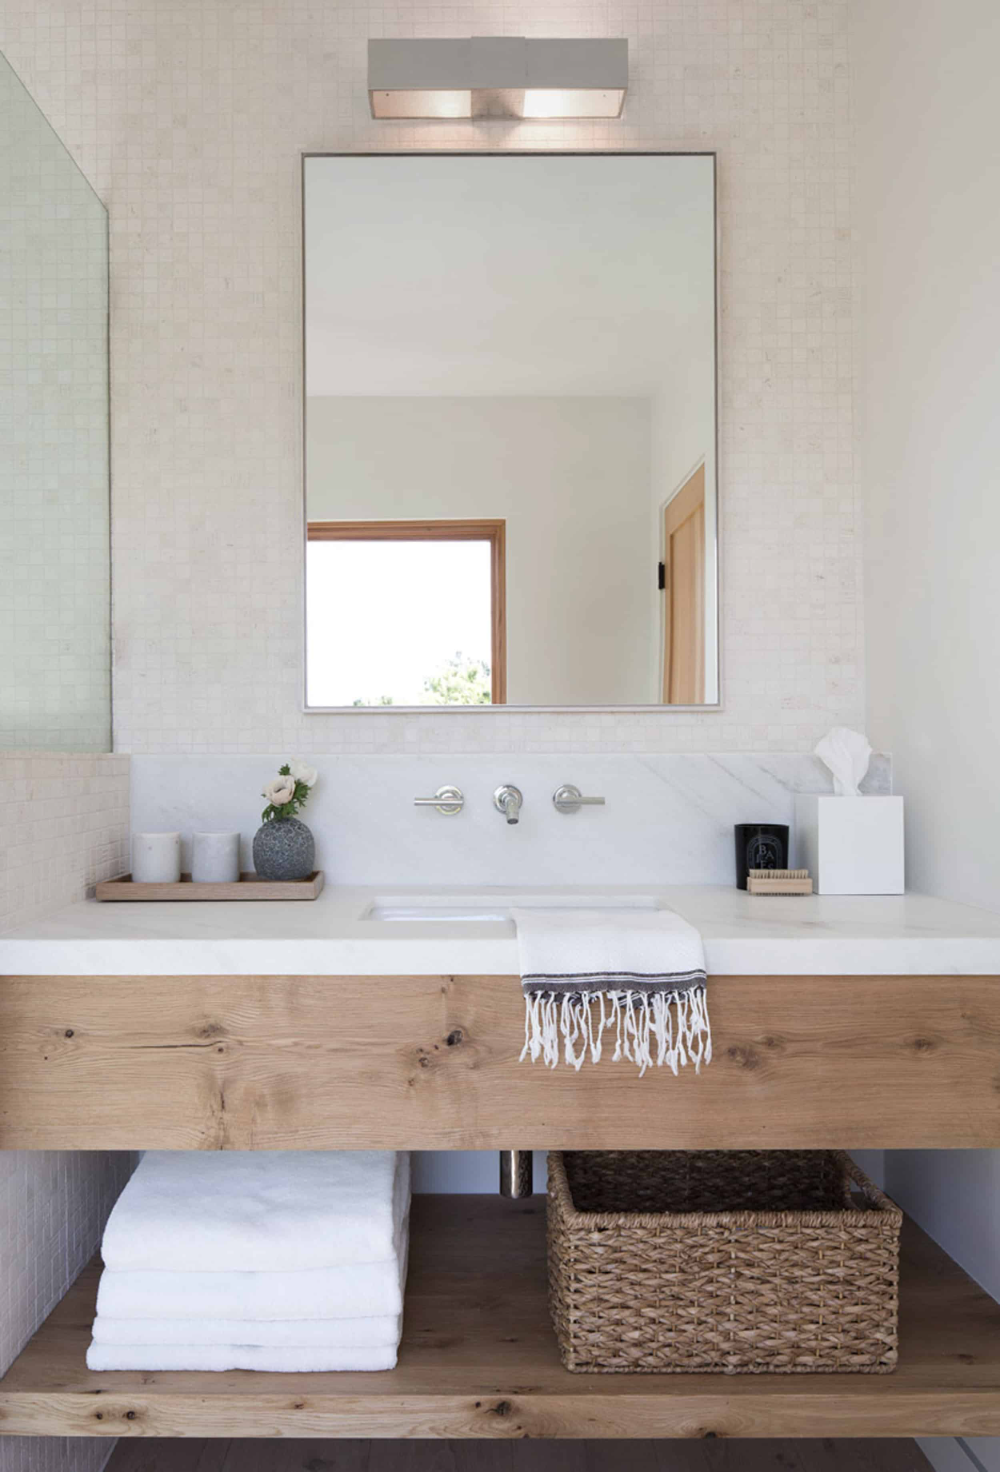 Let S Talk Vessel Sinks Wall Mount Faucets Emily Henderson Bathroom Vanity Trends Bathroom Interior Bathroom Interior Design [ 1472 x 1000 Pixel ]